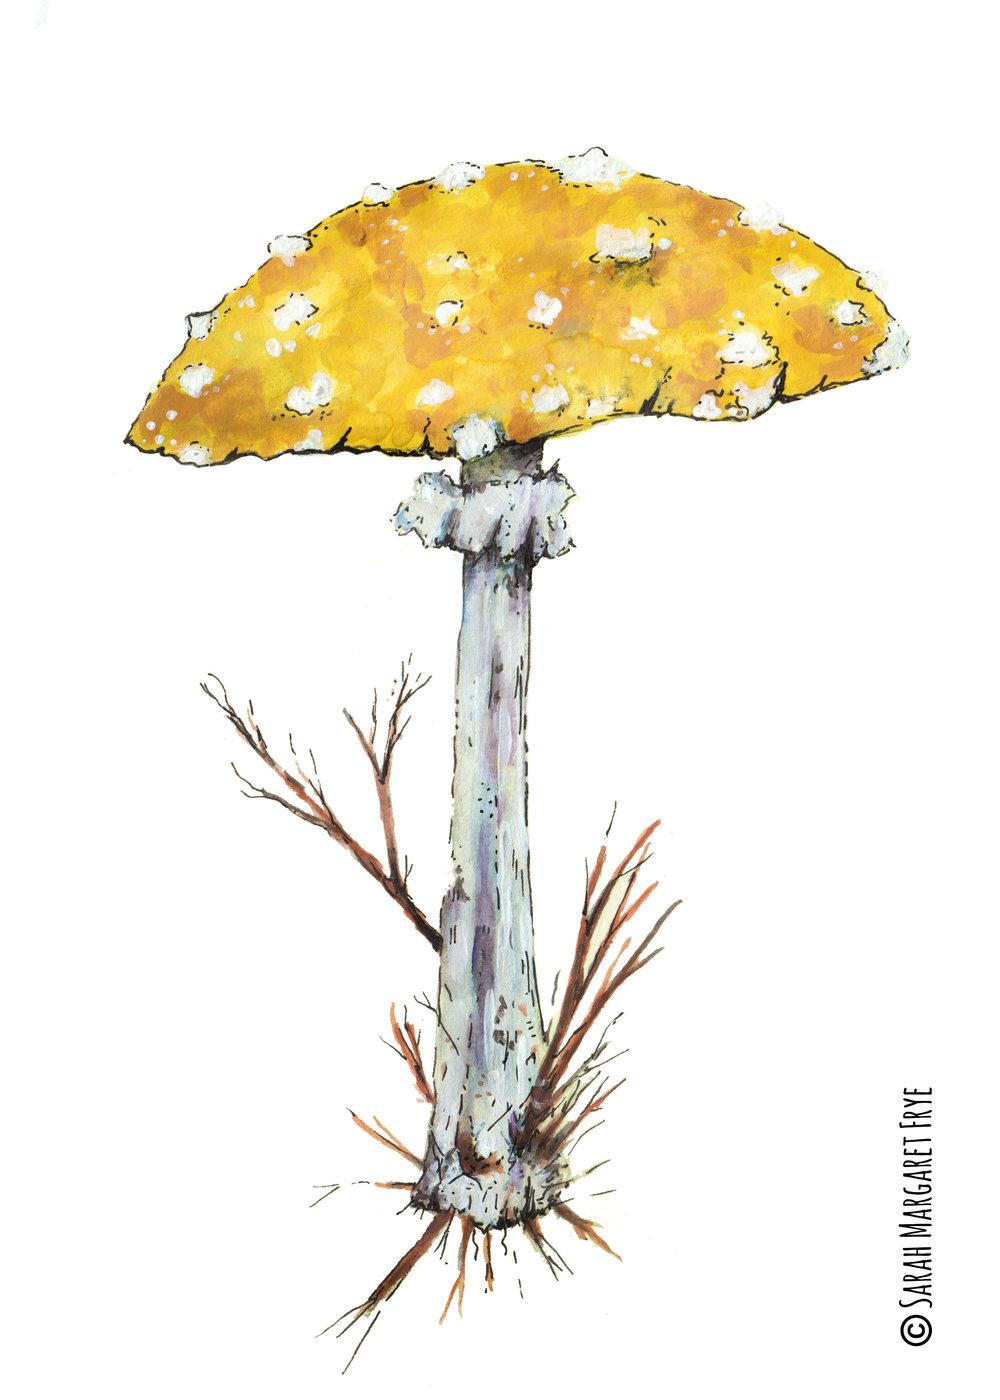 Yellow Mushroom copywriteok.jpg